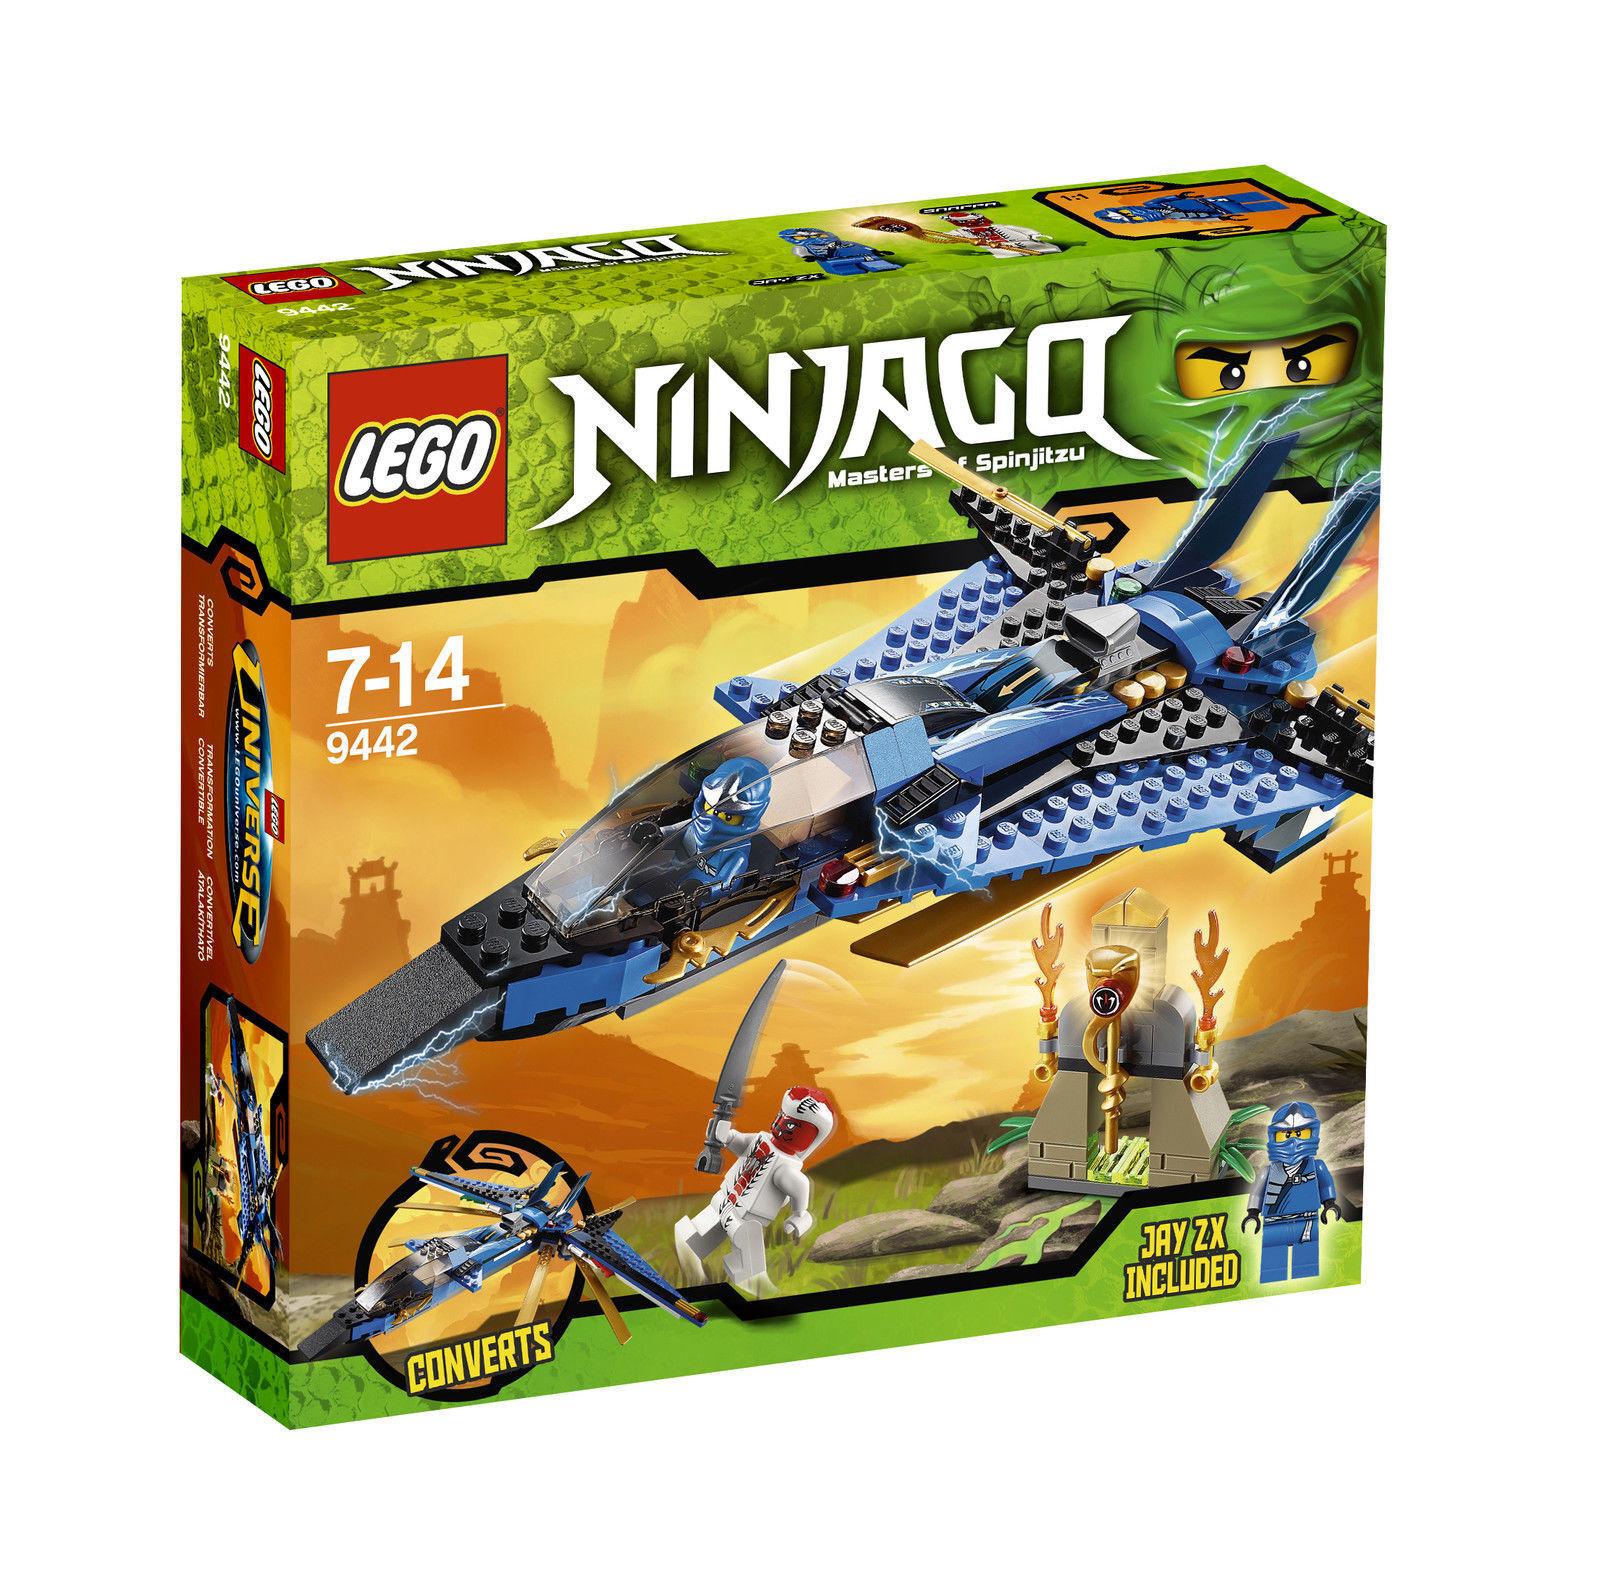 LEGO NINJAGO Jays Donner Jet 25